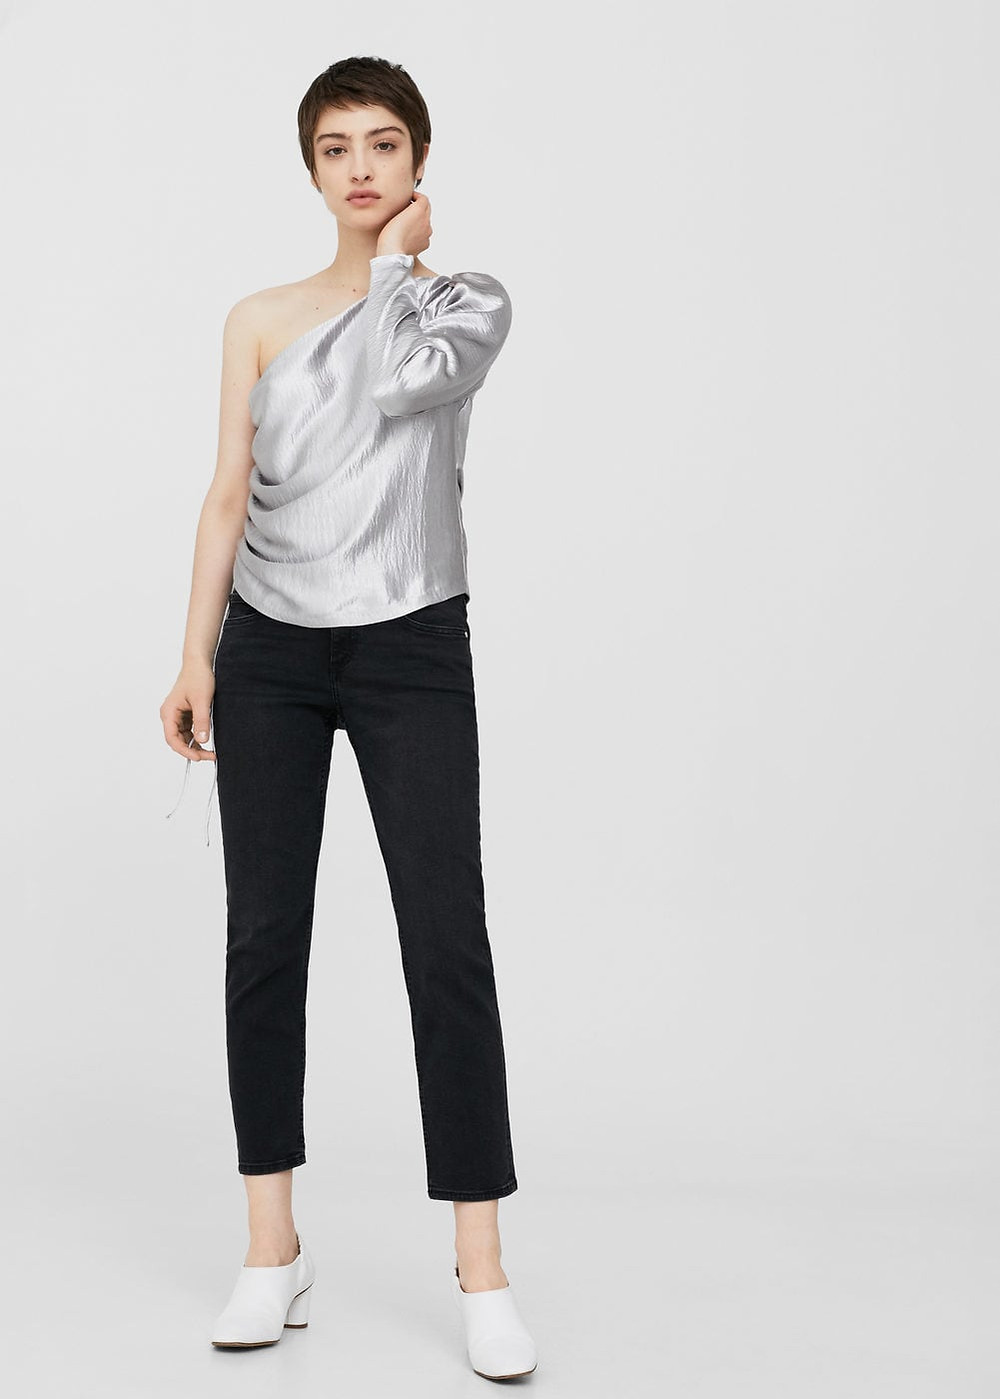 Mango Asymmetric metallic blouse $49.99